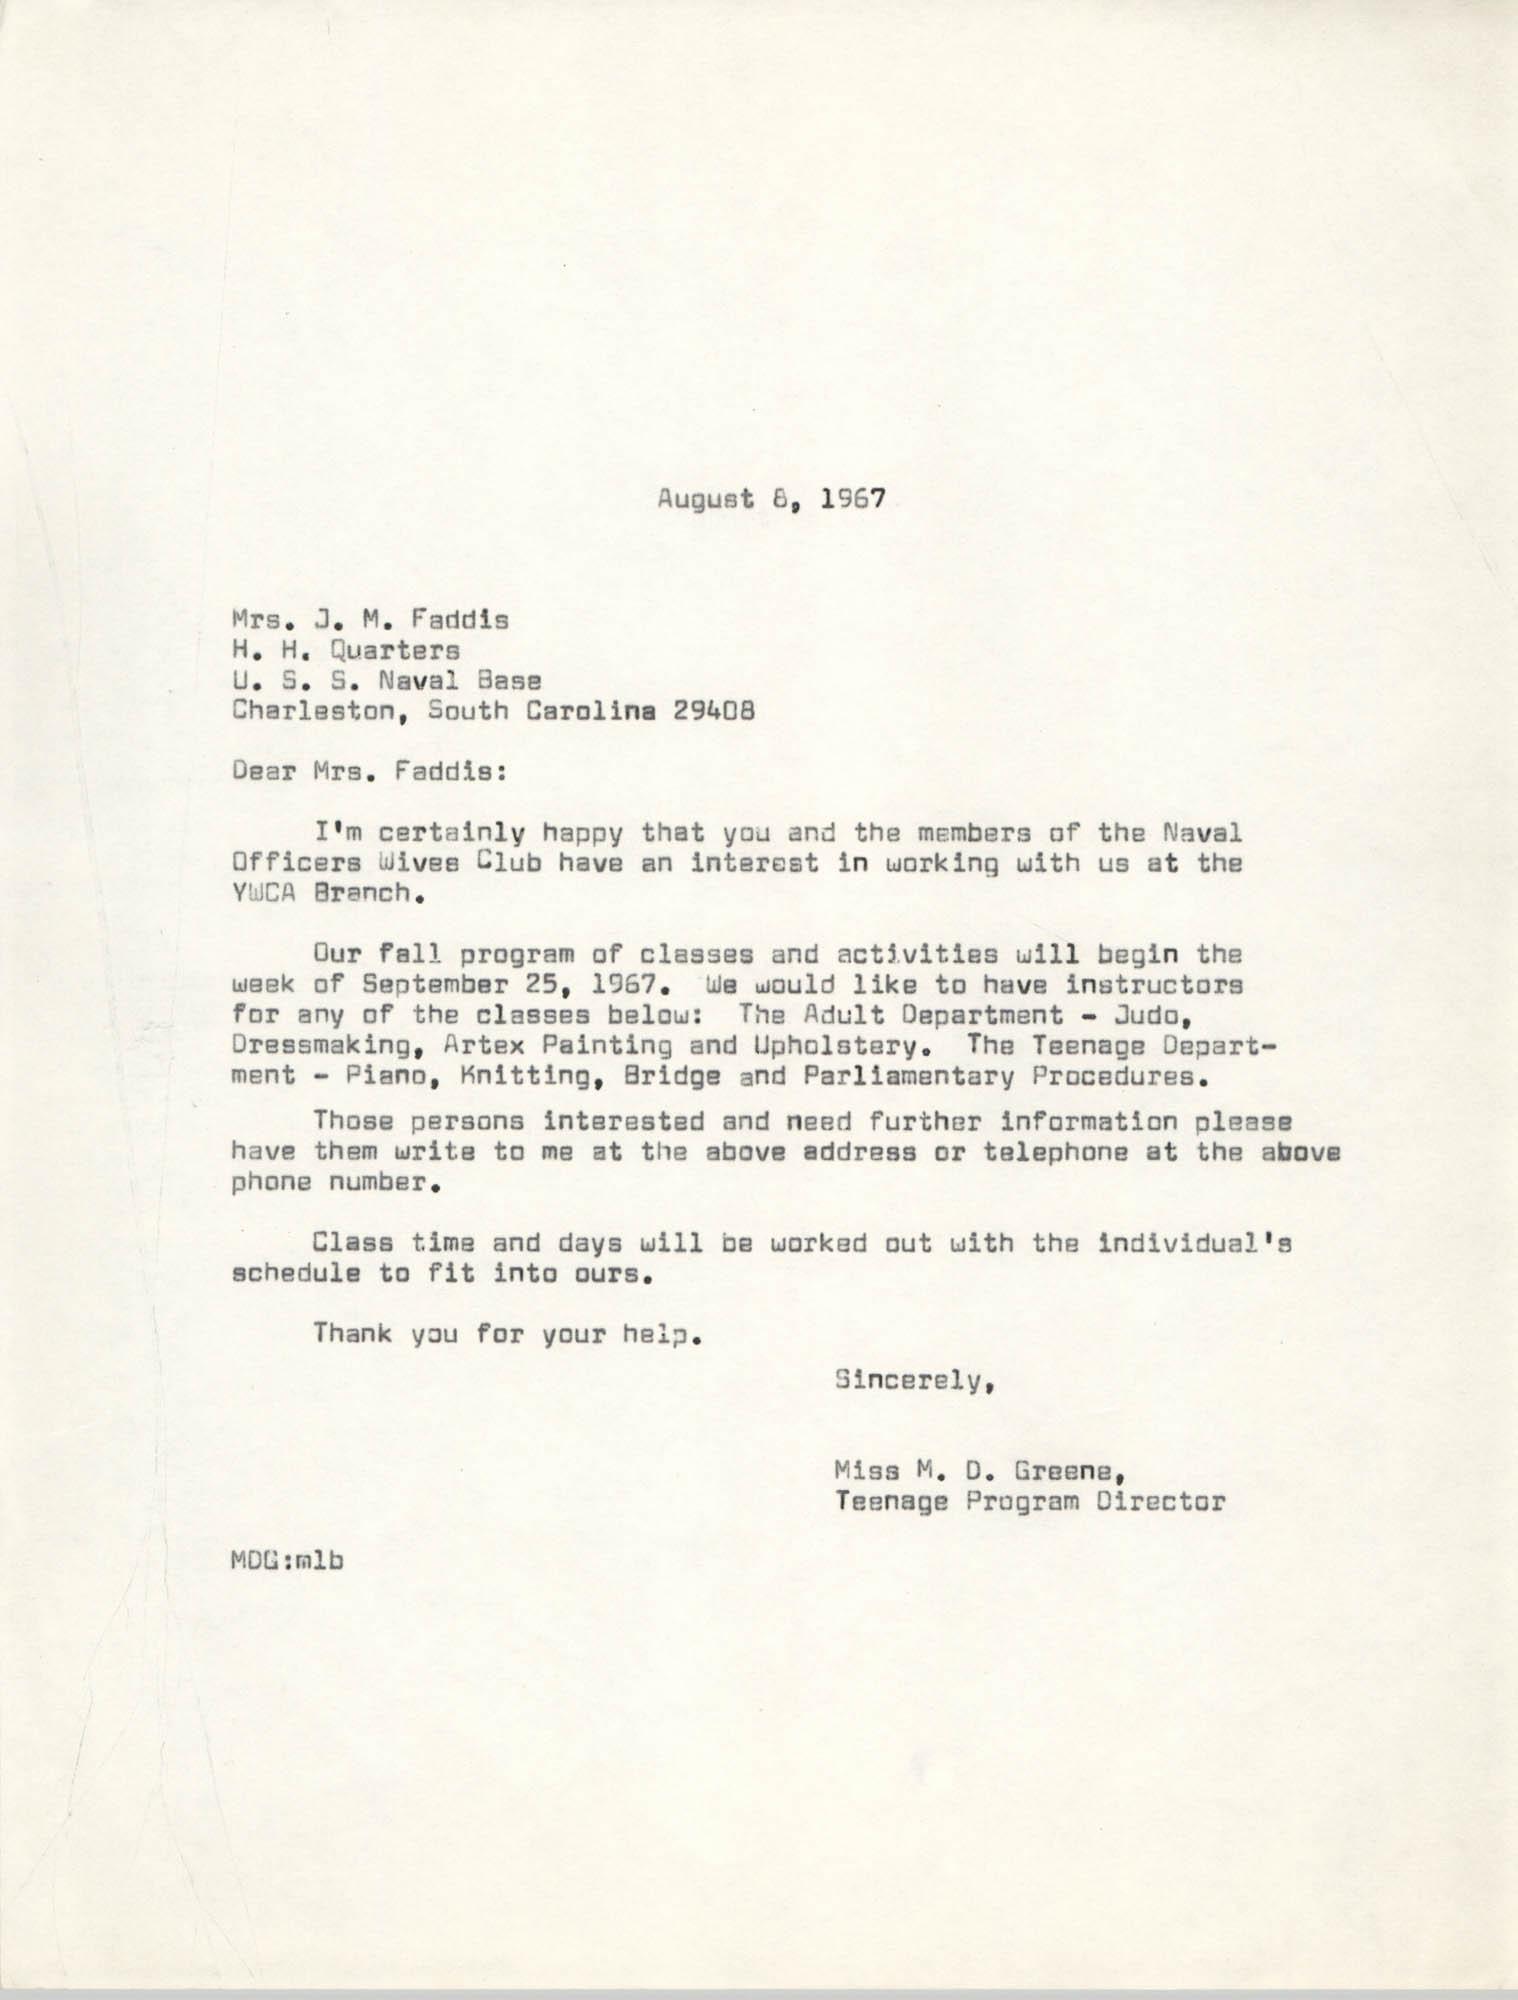 Letter from Marguerite D. Greene to Mrs. J. M. Faddis, August 8, 1967